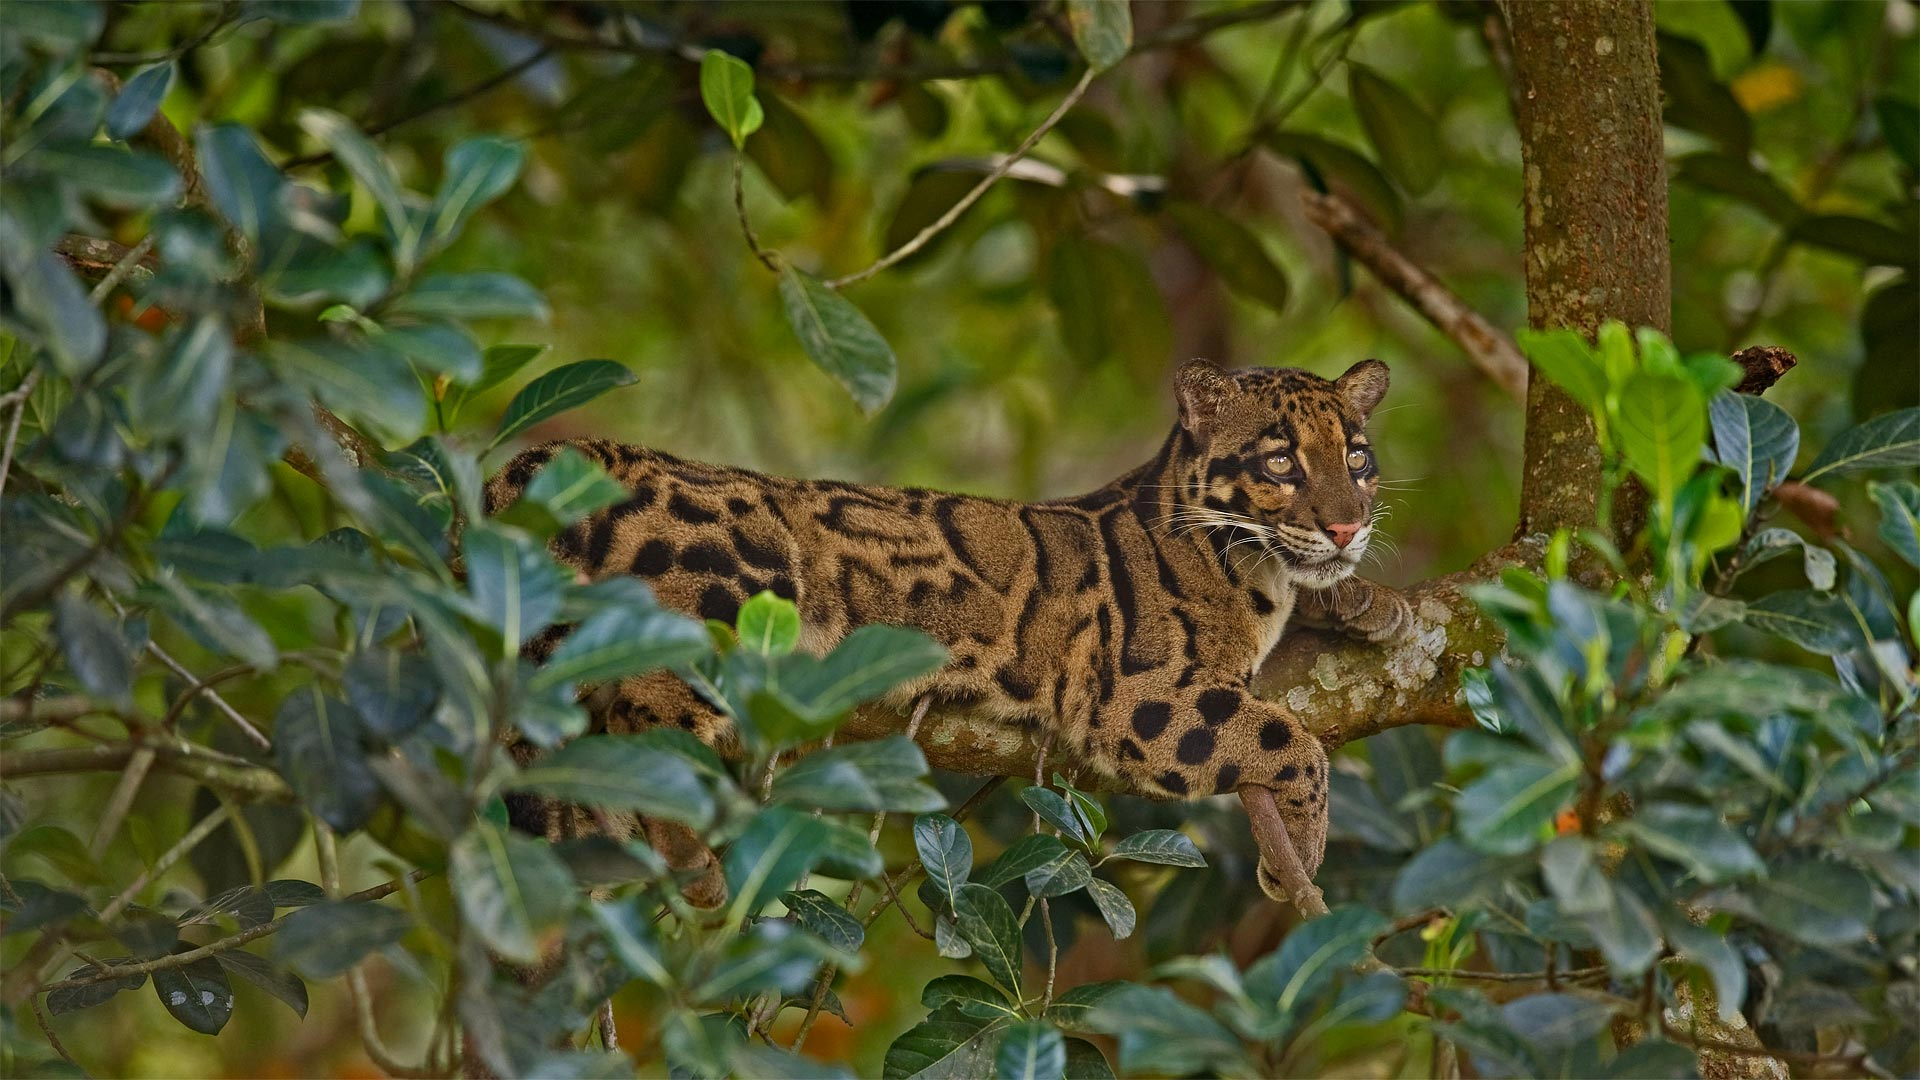 Clouded leopard (? Dhritiman Mukherjee/Alamy)